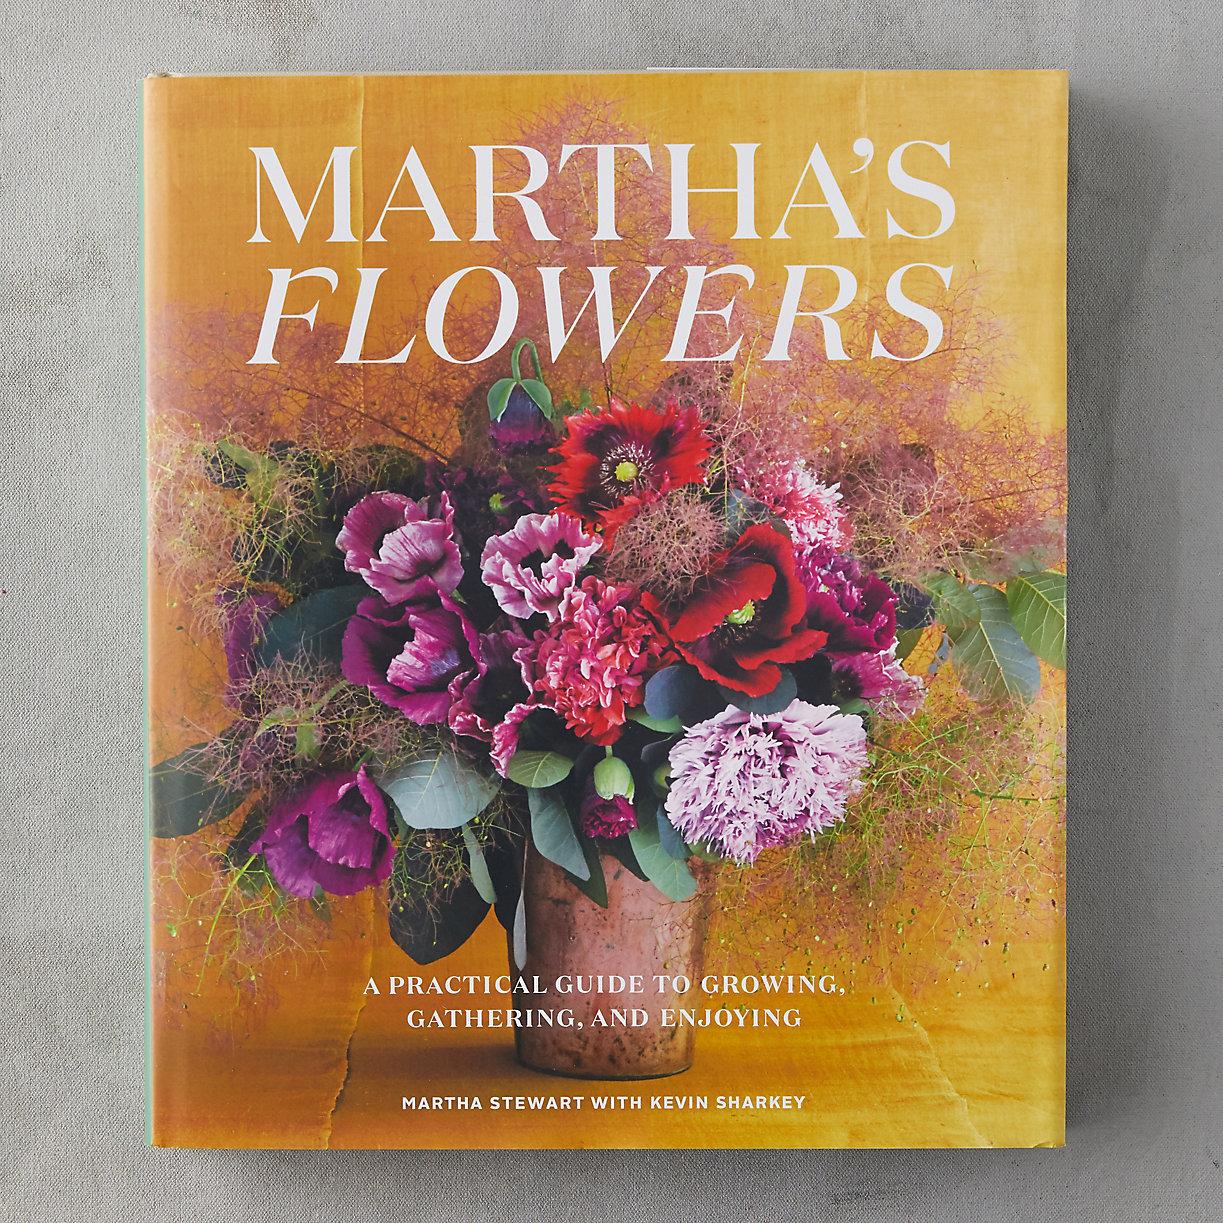 Martha's Flowers, $75